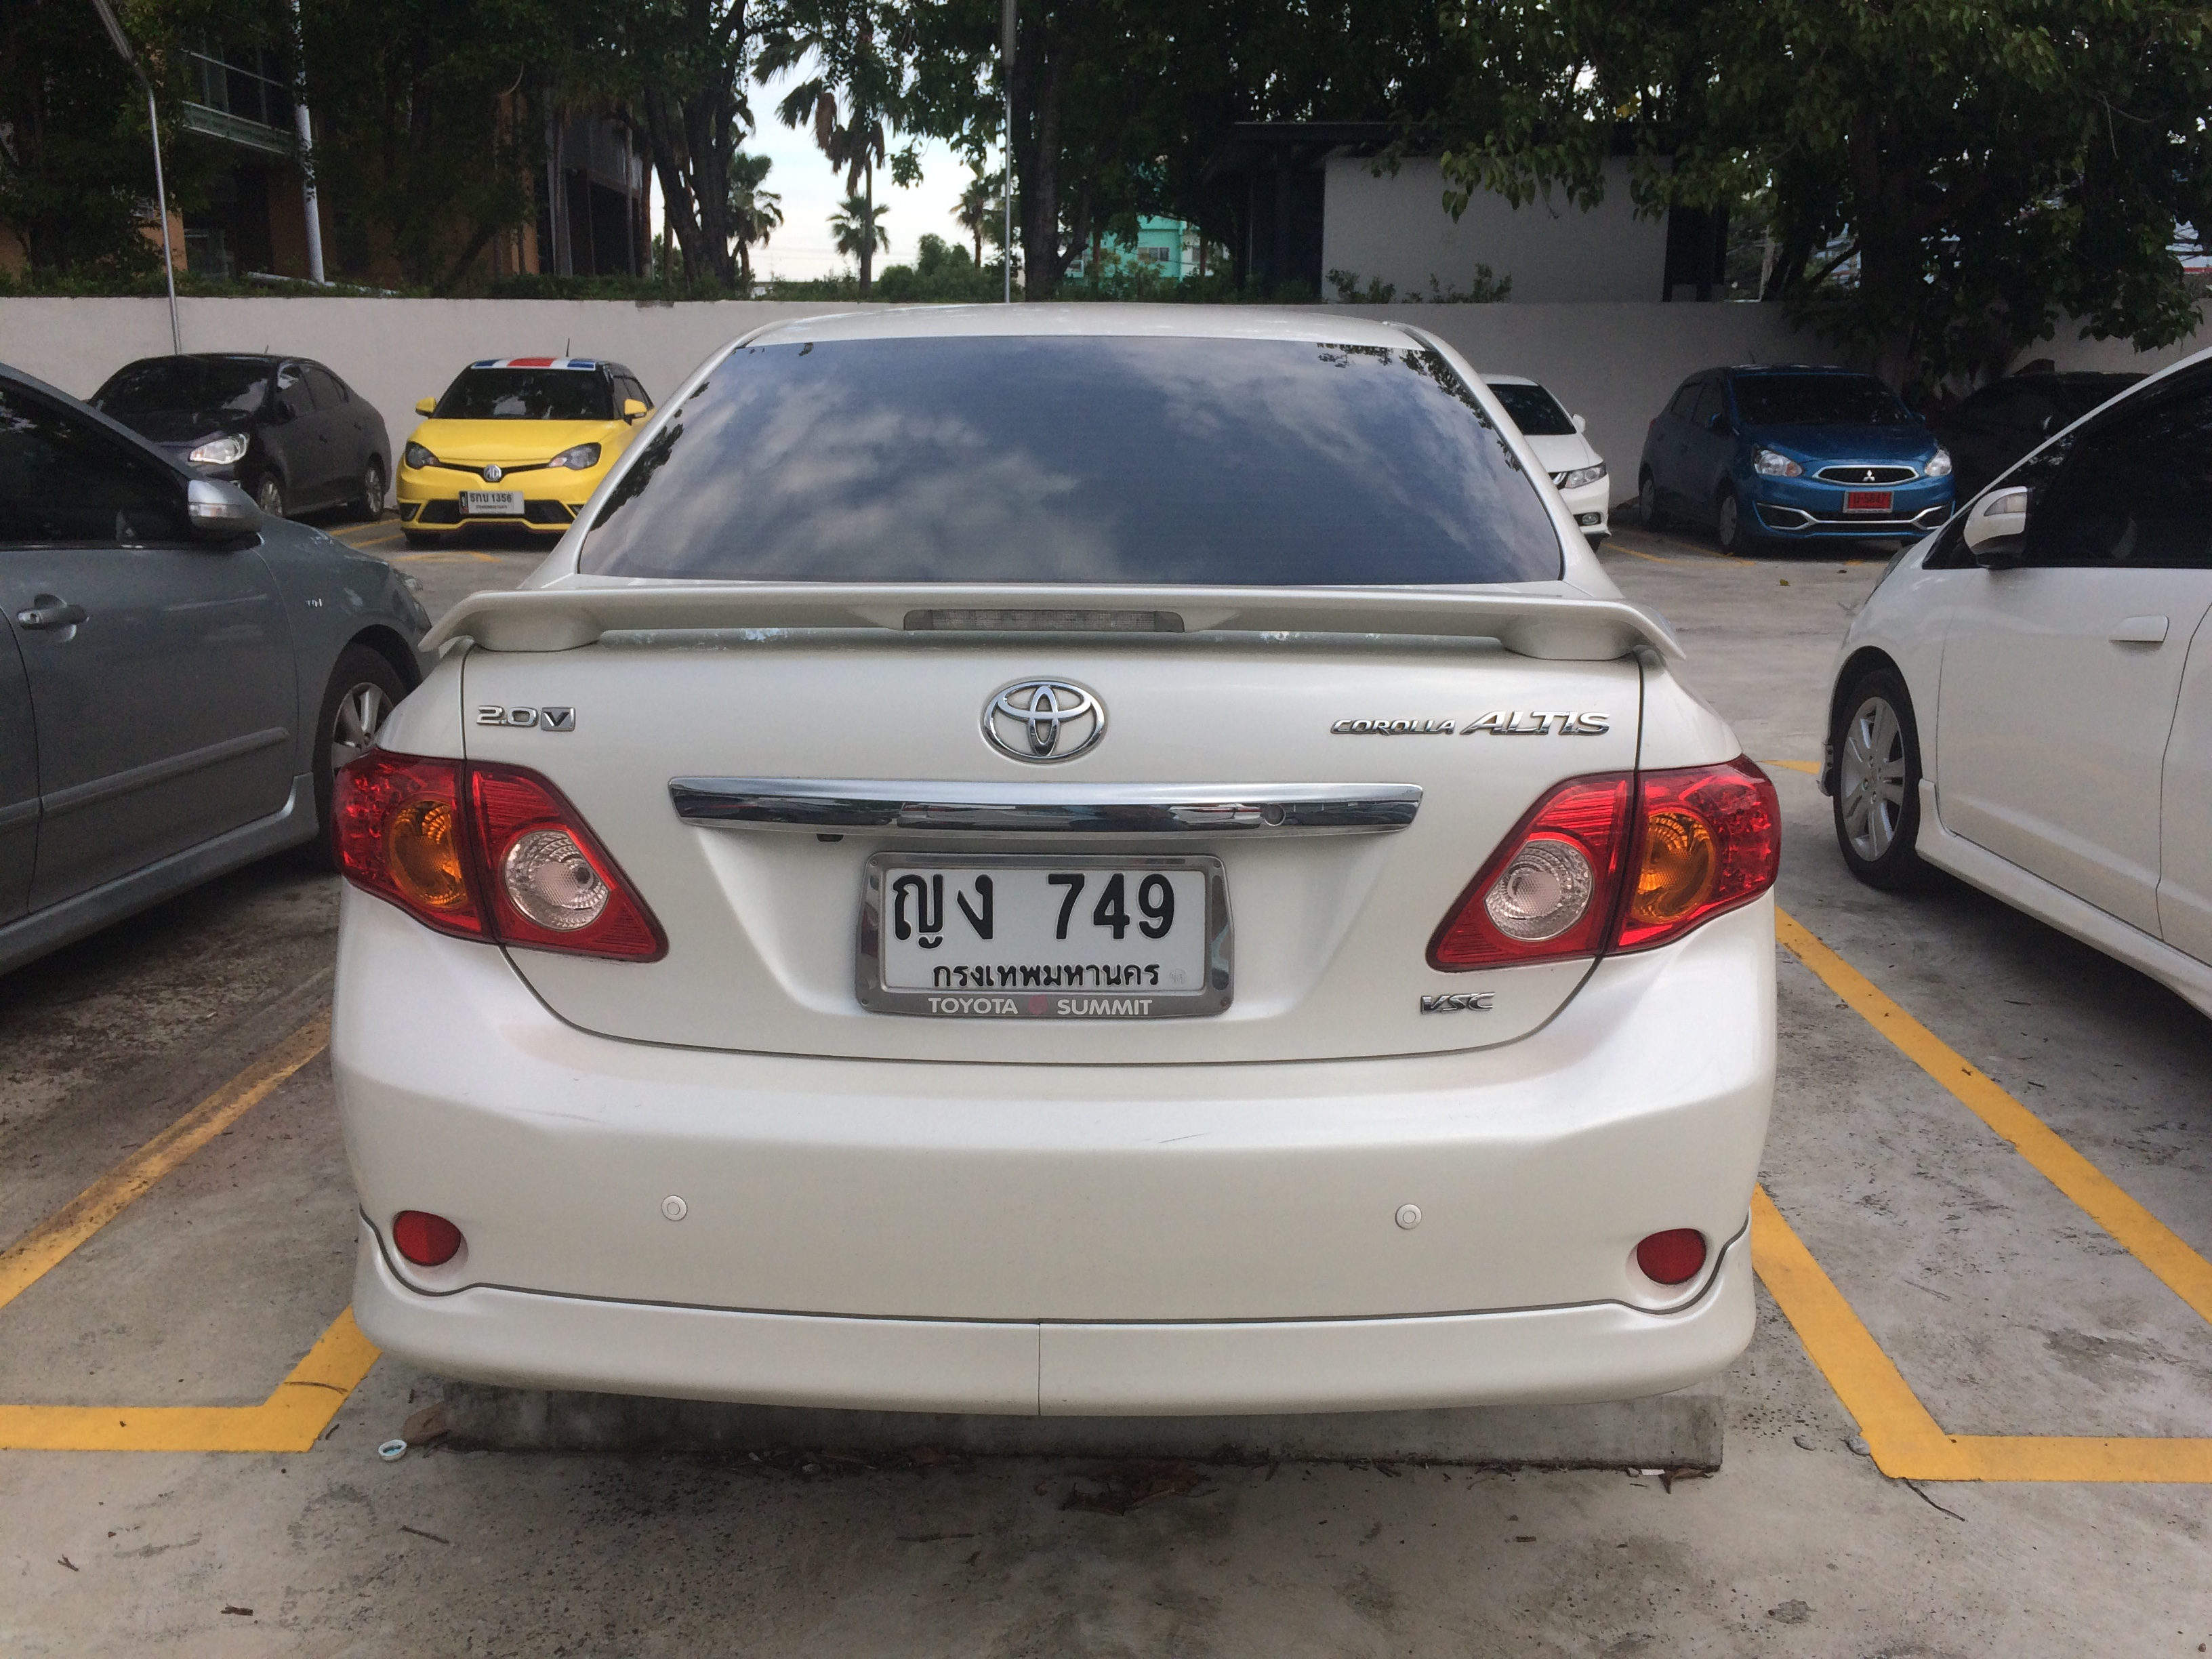 Kelebihan Toyota Altis 2009 Harga